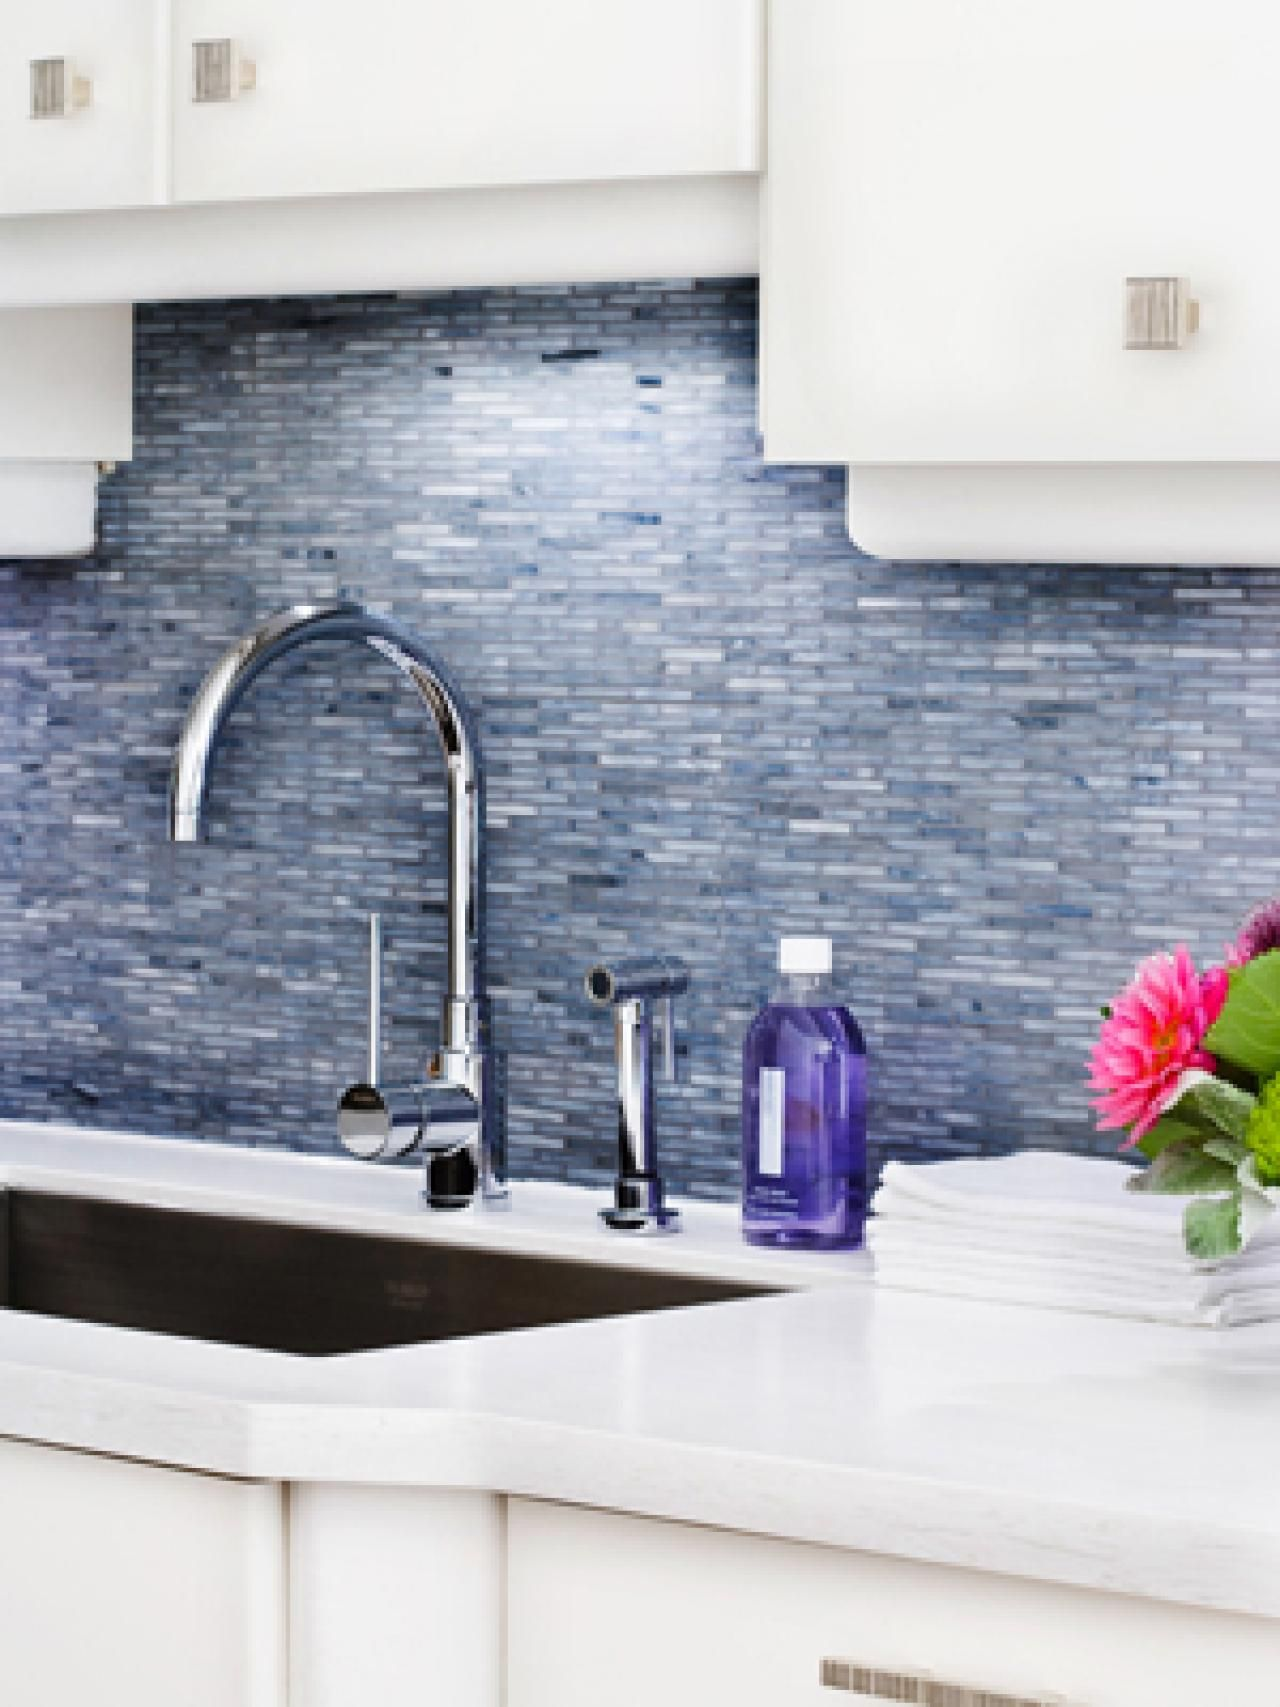 Self-Adhesive Backsplash Tiles | Grey backsplash, Grey tiles and ...